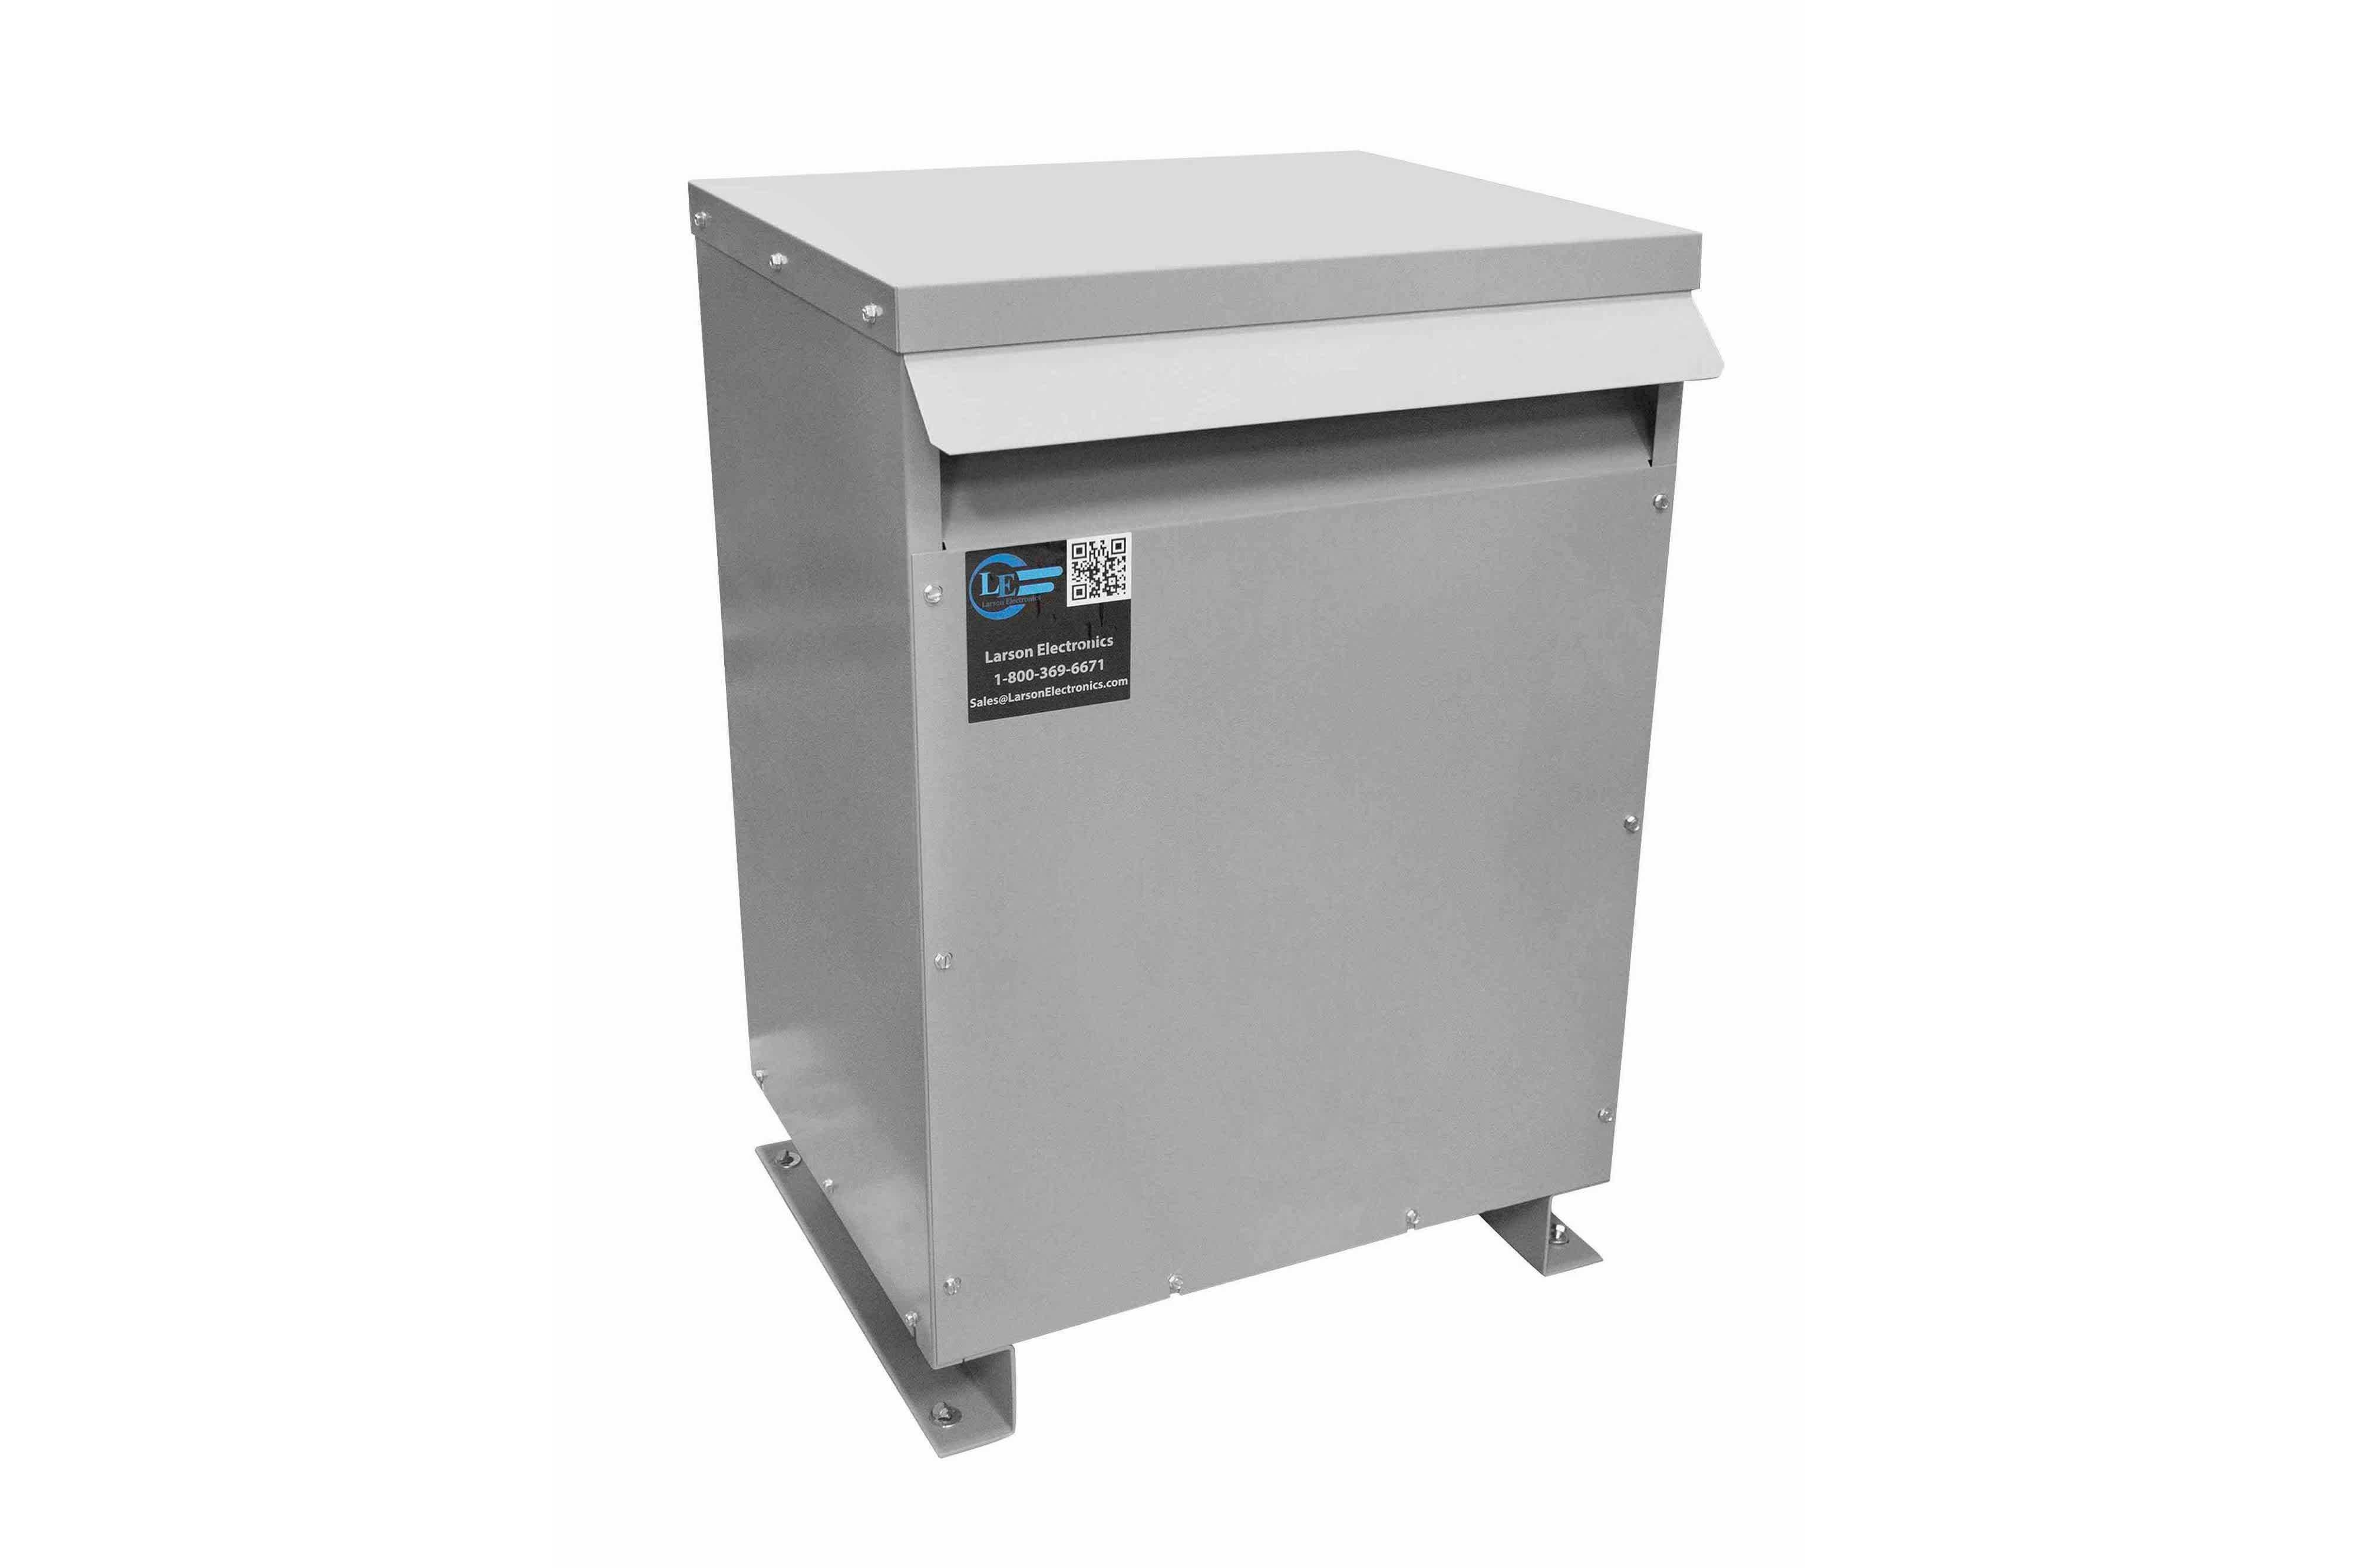 18 kVA 3PH Isolation Transformer, 460V Wye Primary, 380V Delta Secondary, N3R, Ventilated, 60 Hz